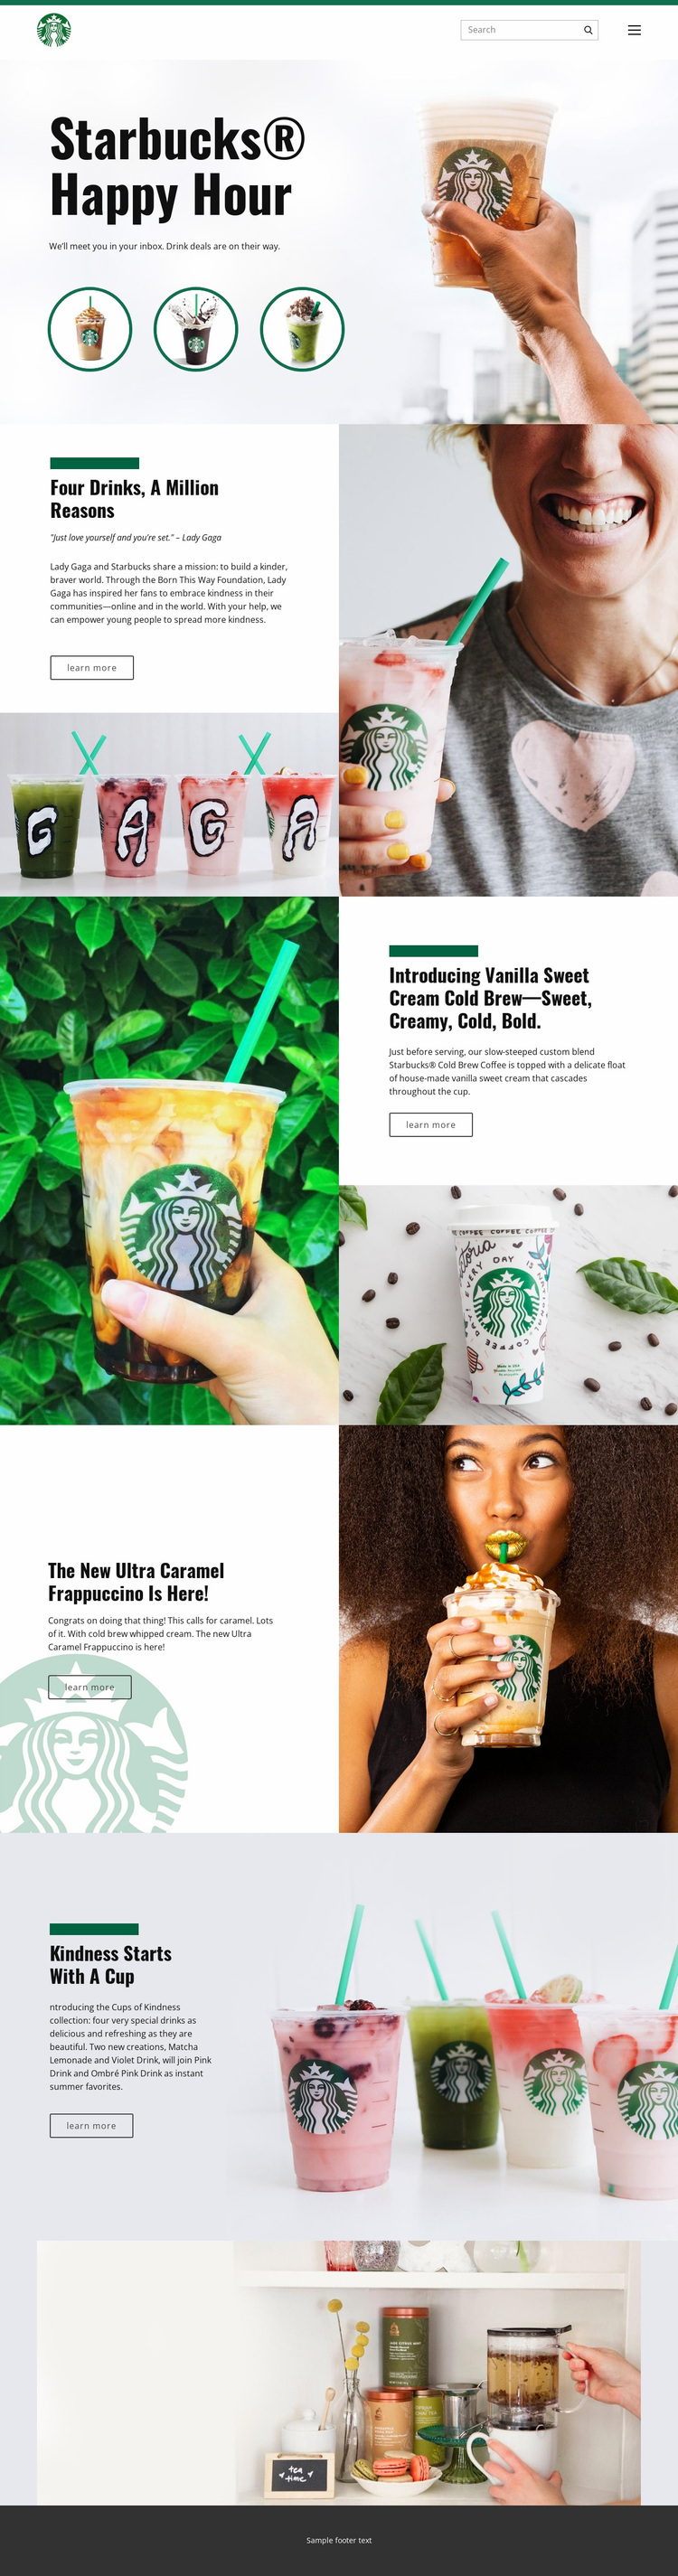 Starbucks Coffee Website Design